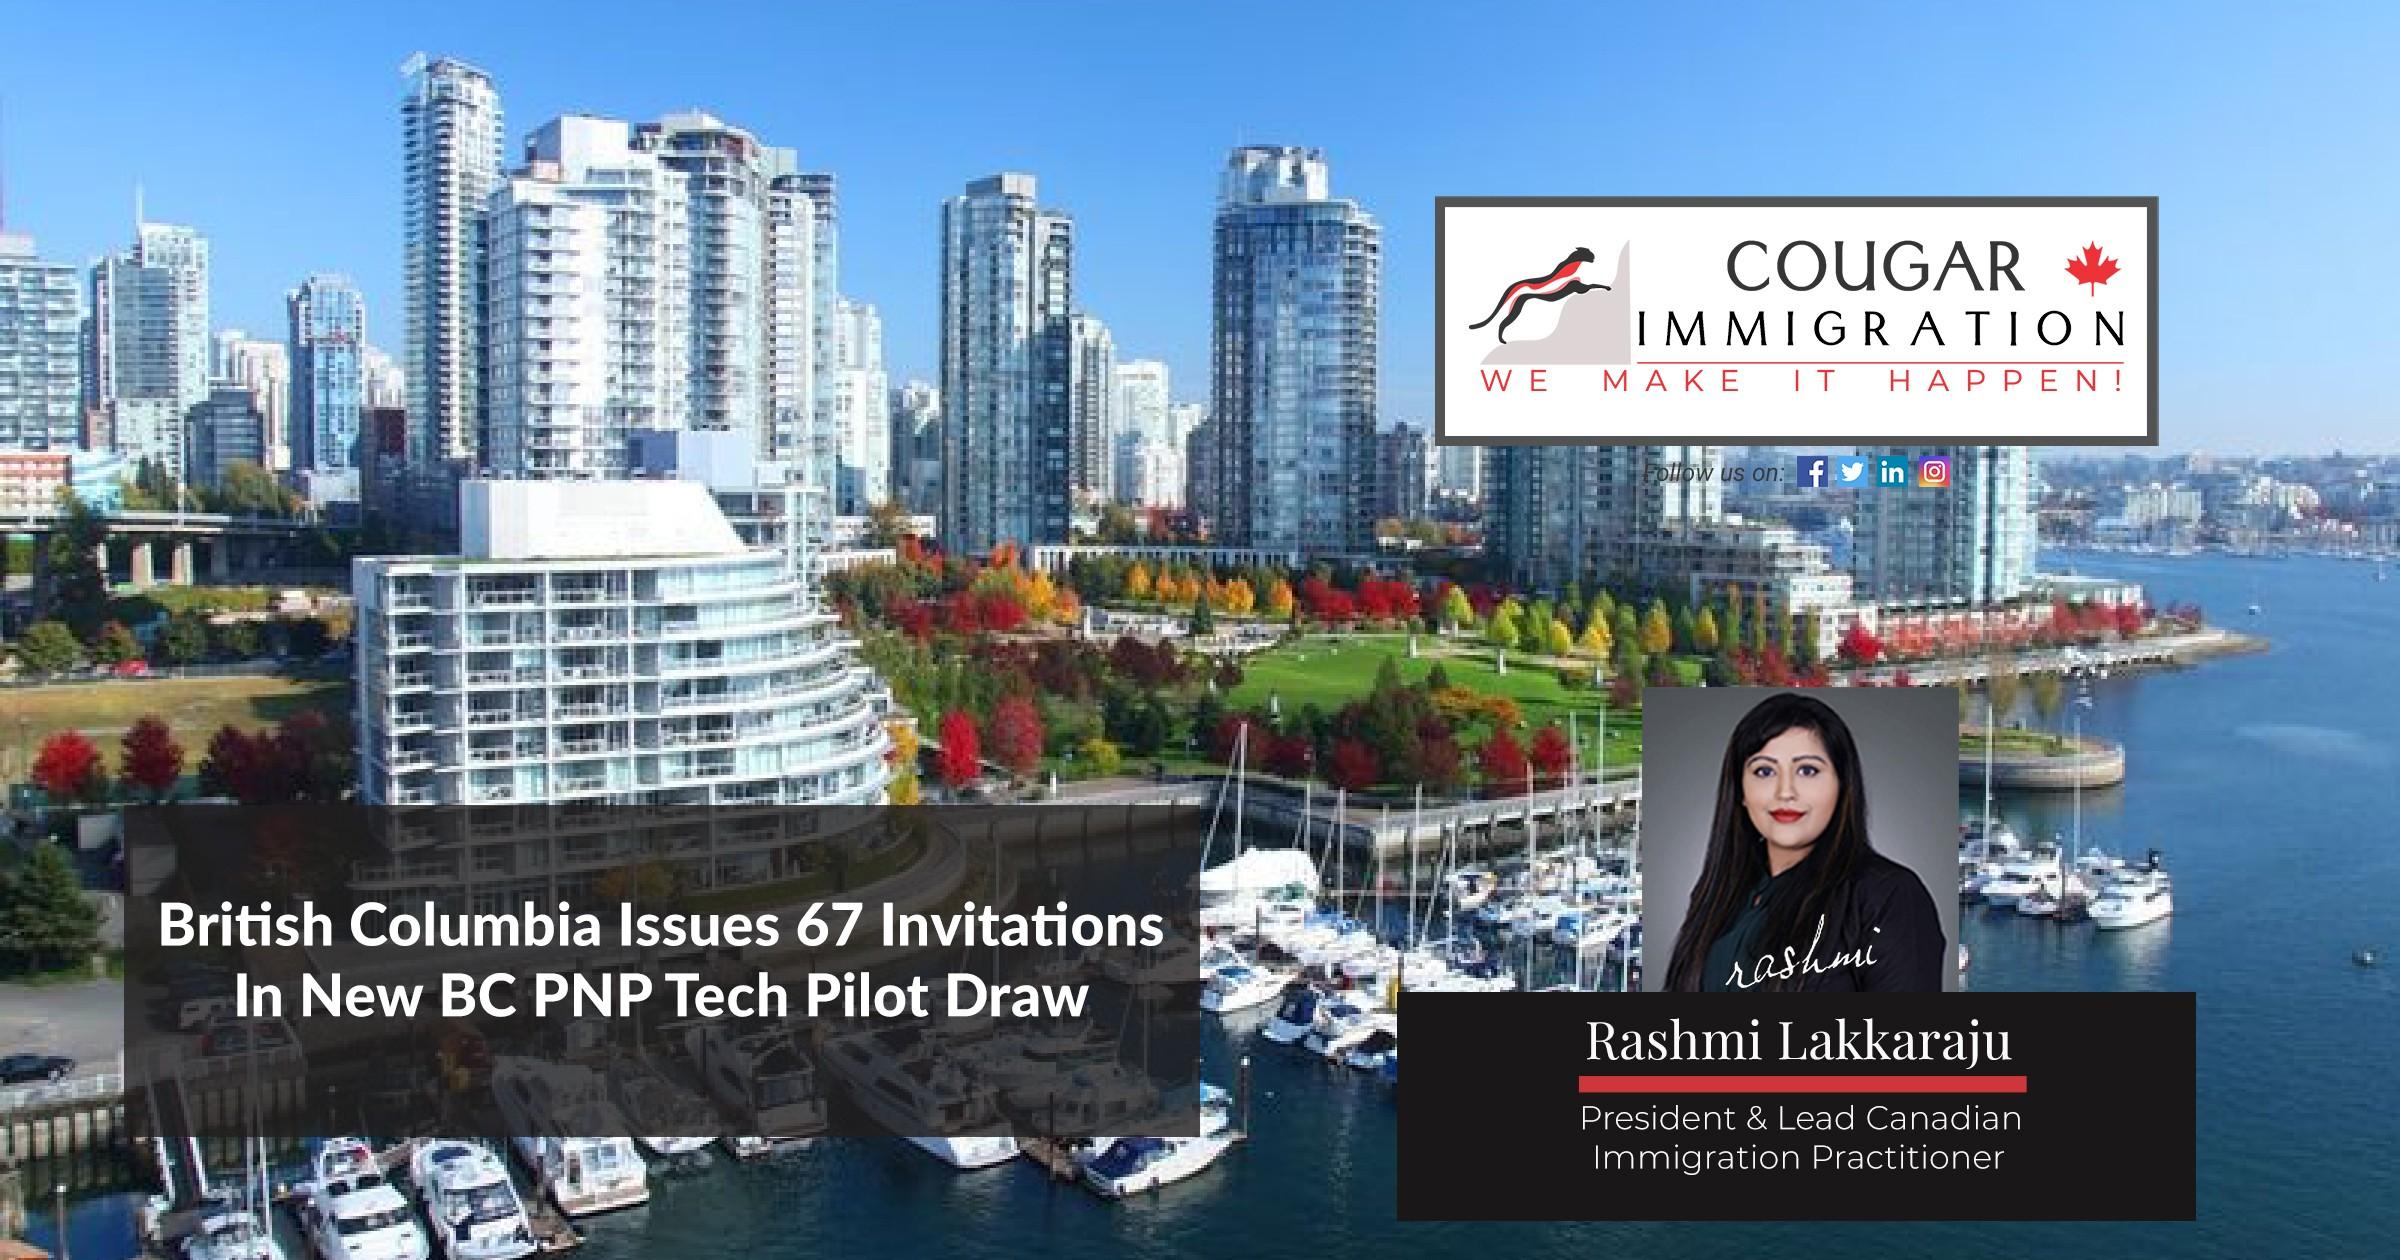 British Columbia Issues 67 Invitations In New BC PNP Tech Pilot Draw thumbnail